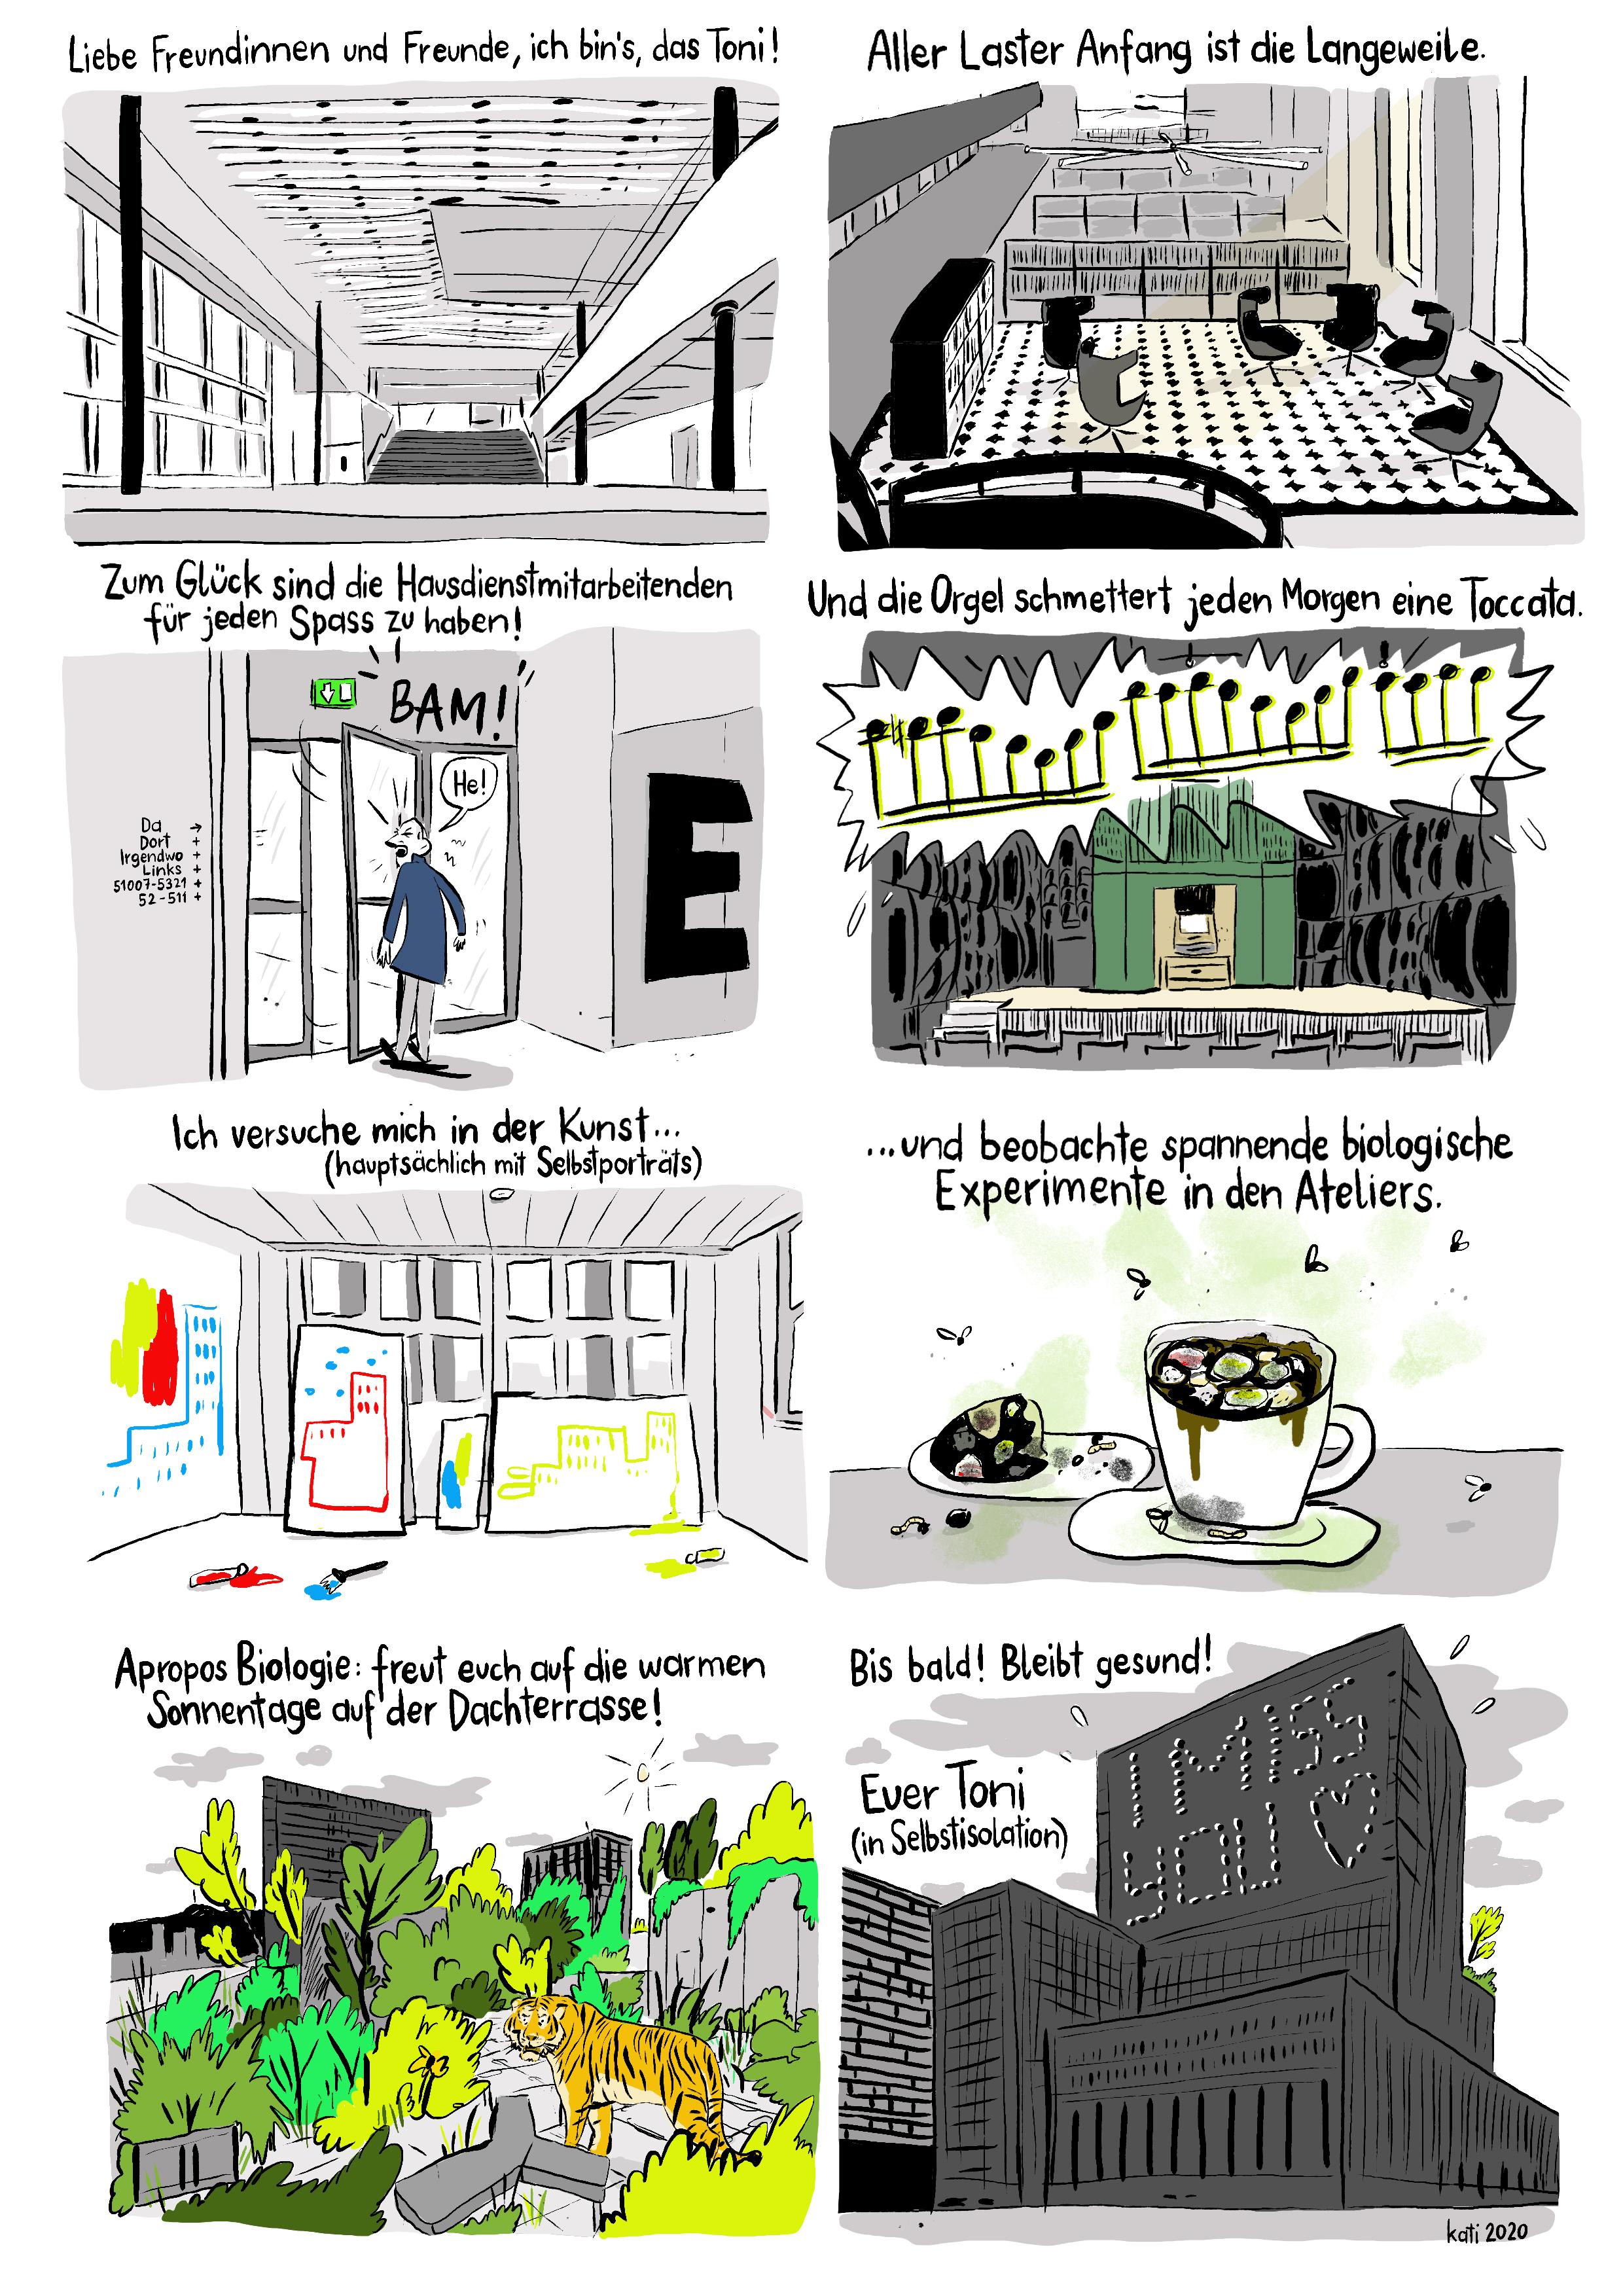 Das Toni in Selbstisolation, Comic von Kati Rickenbach